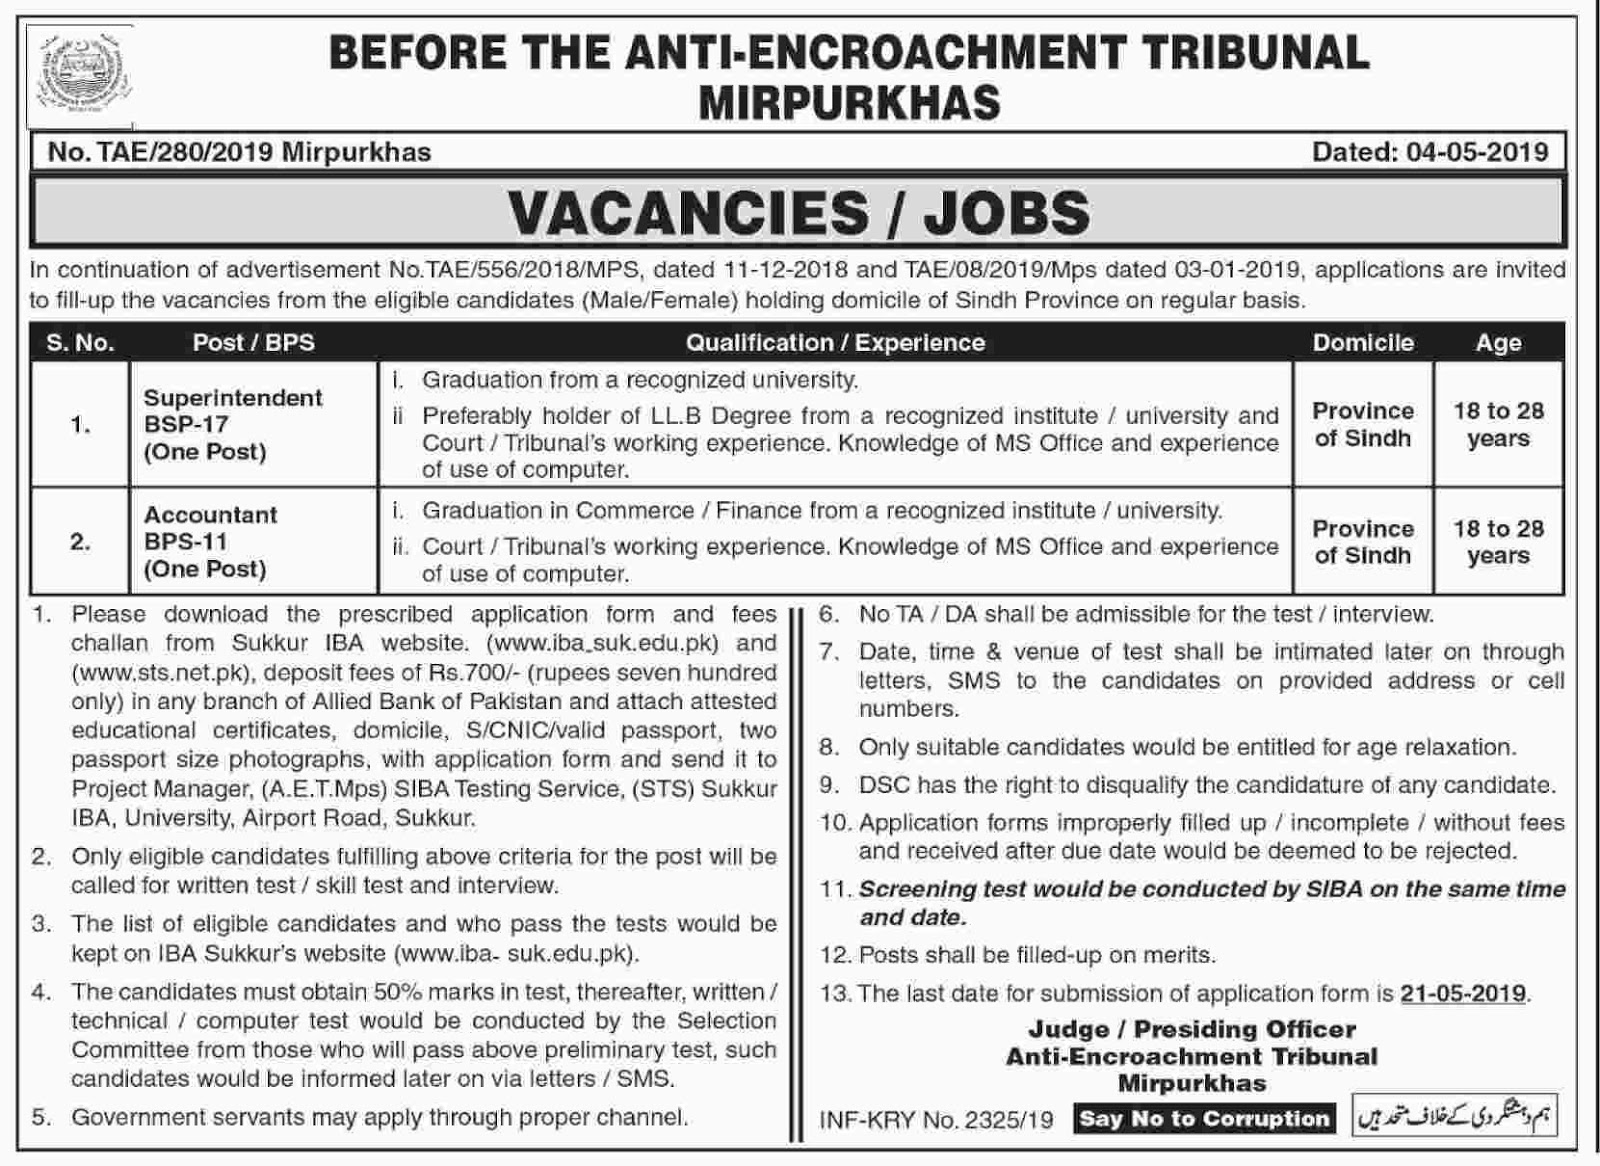 Anti Encroachment Tribunal Mirpurkhas